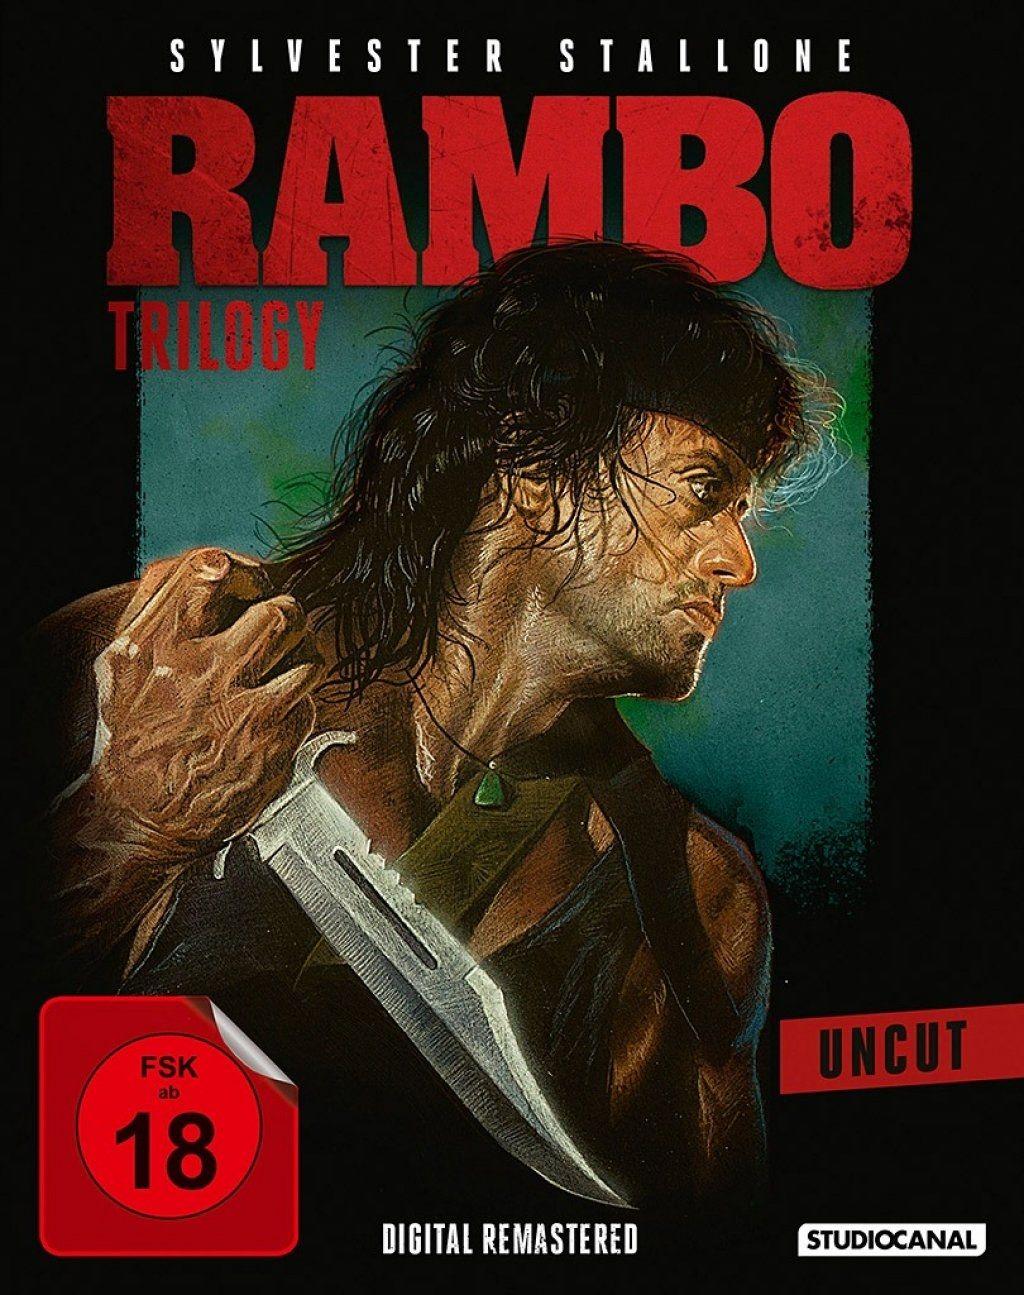 Rambo Trilogy (Uncut) (3 Discs) (BLURAY)